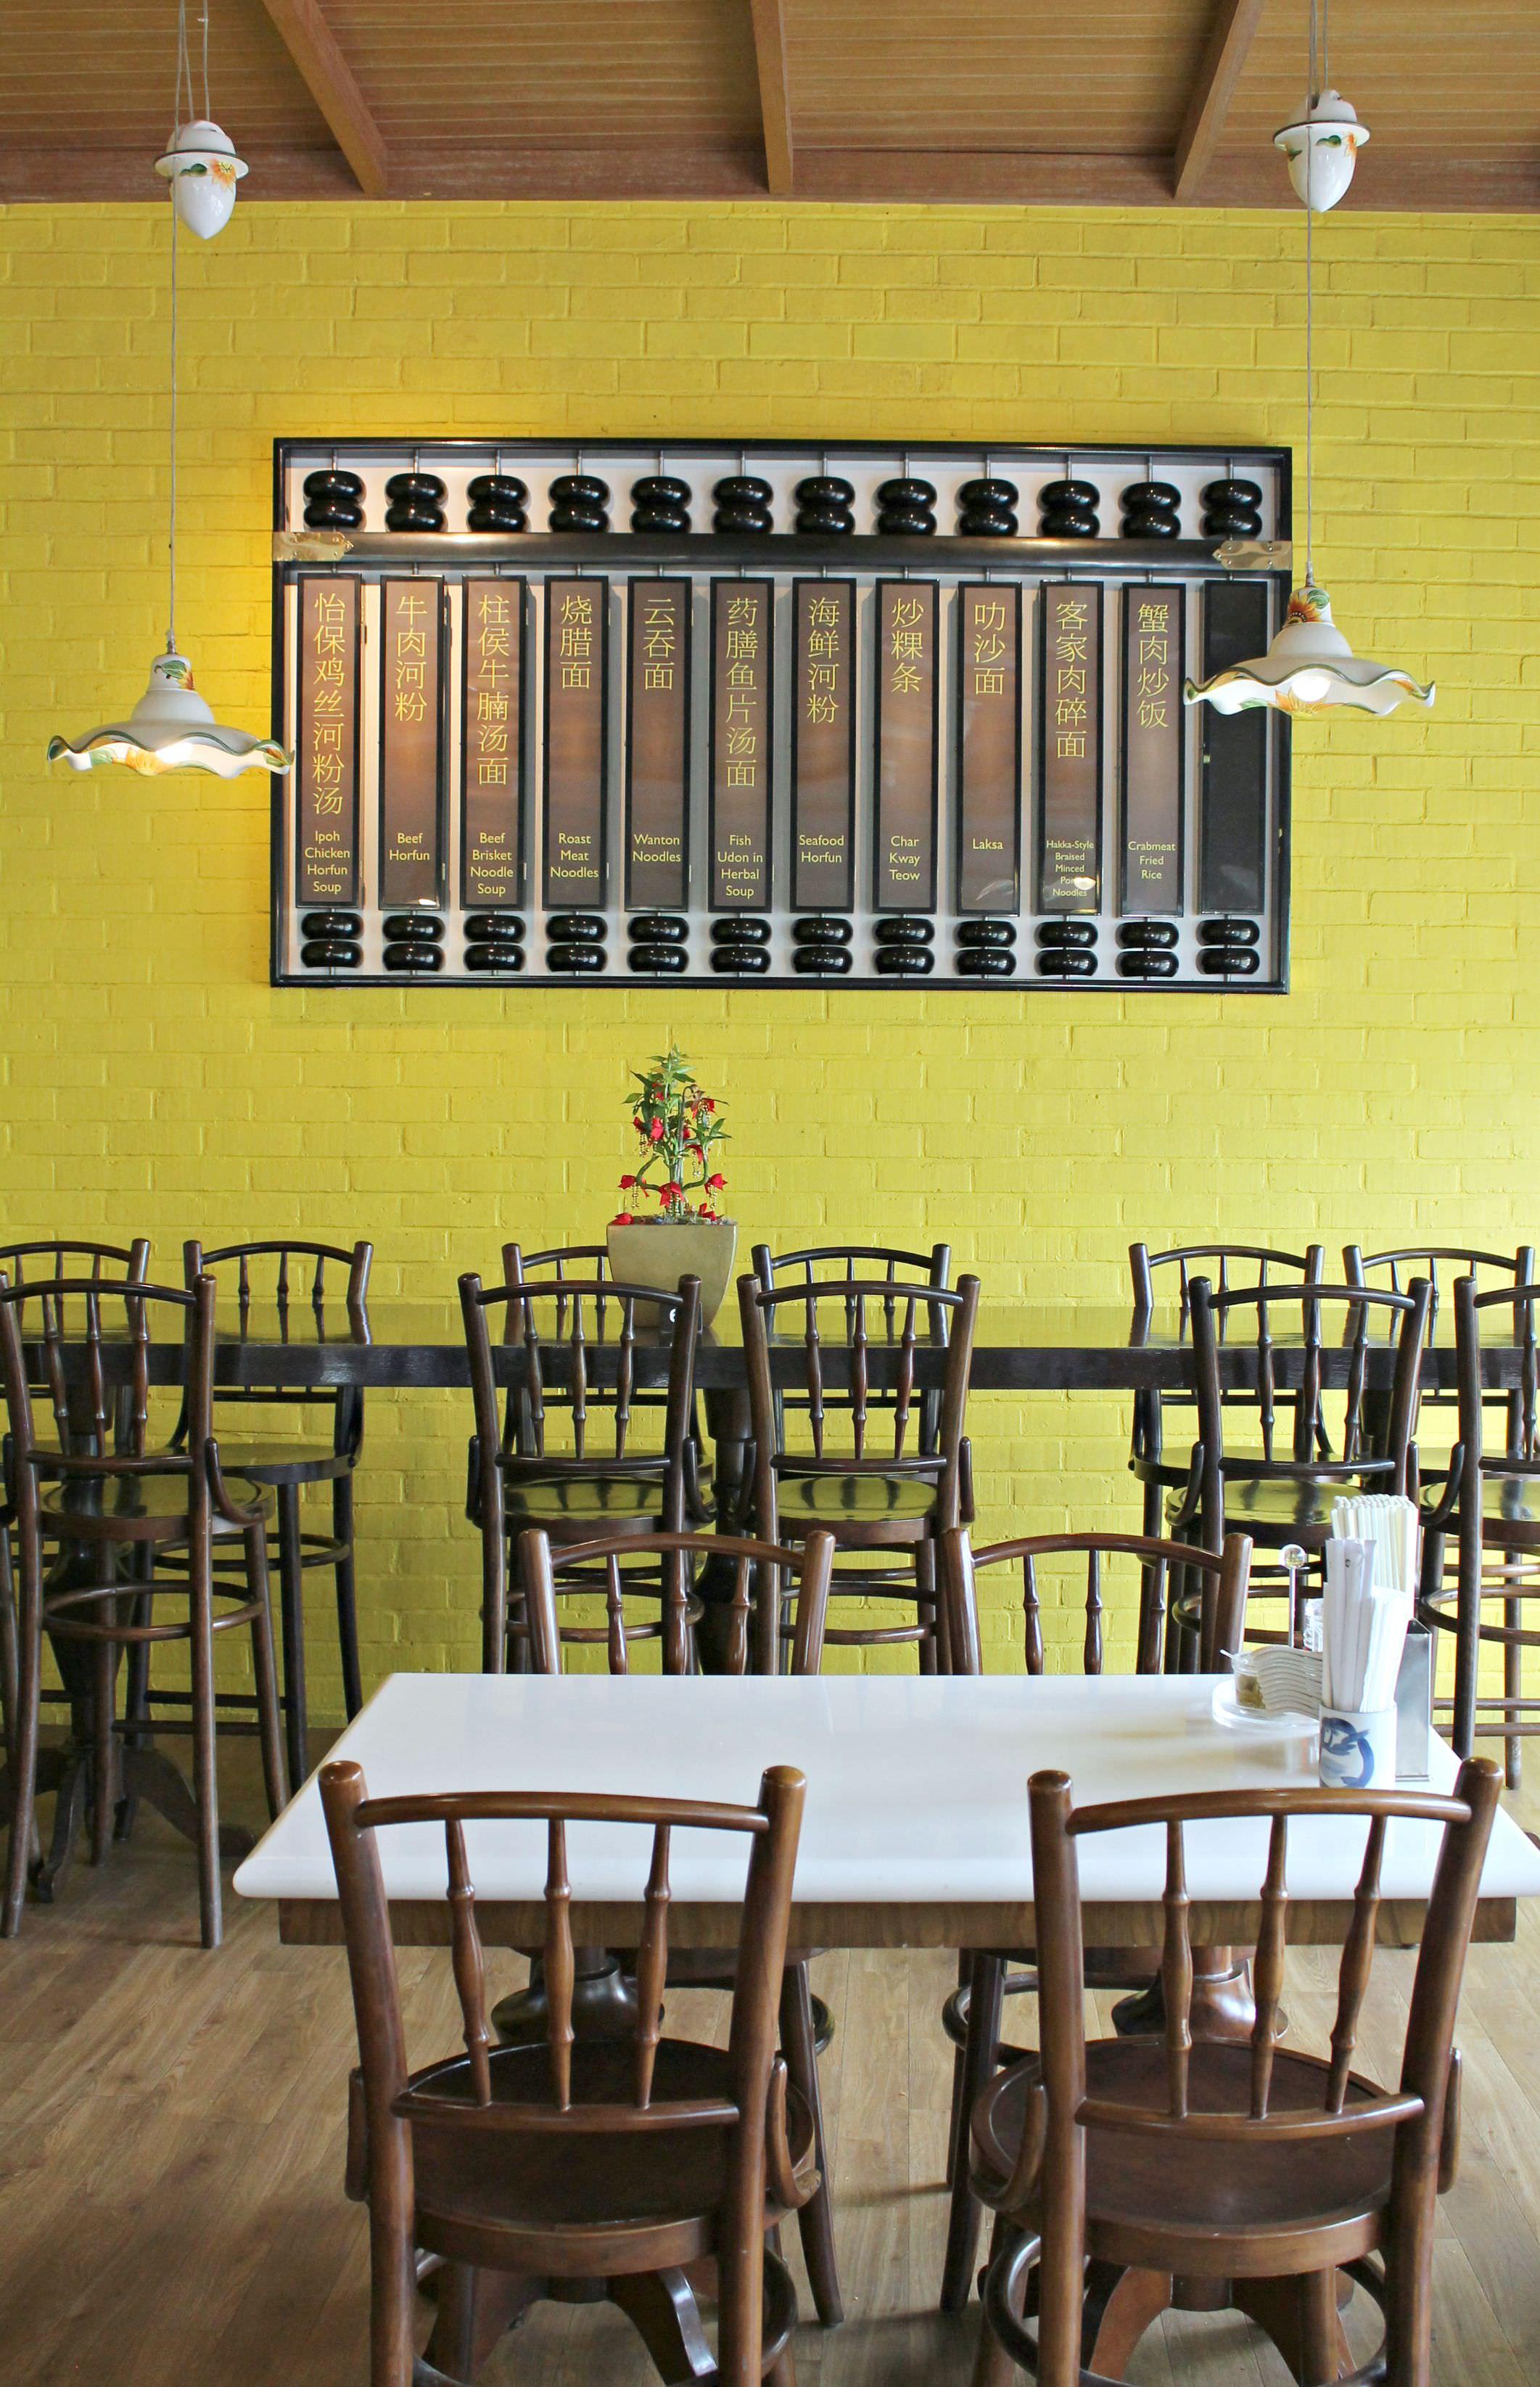 8-noodles-restaurant-Rasa-Sentosa-photo-by-Little-Big-Bell